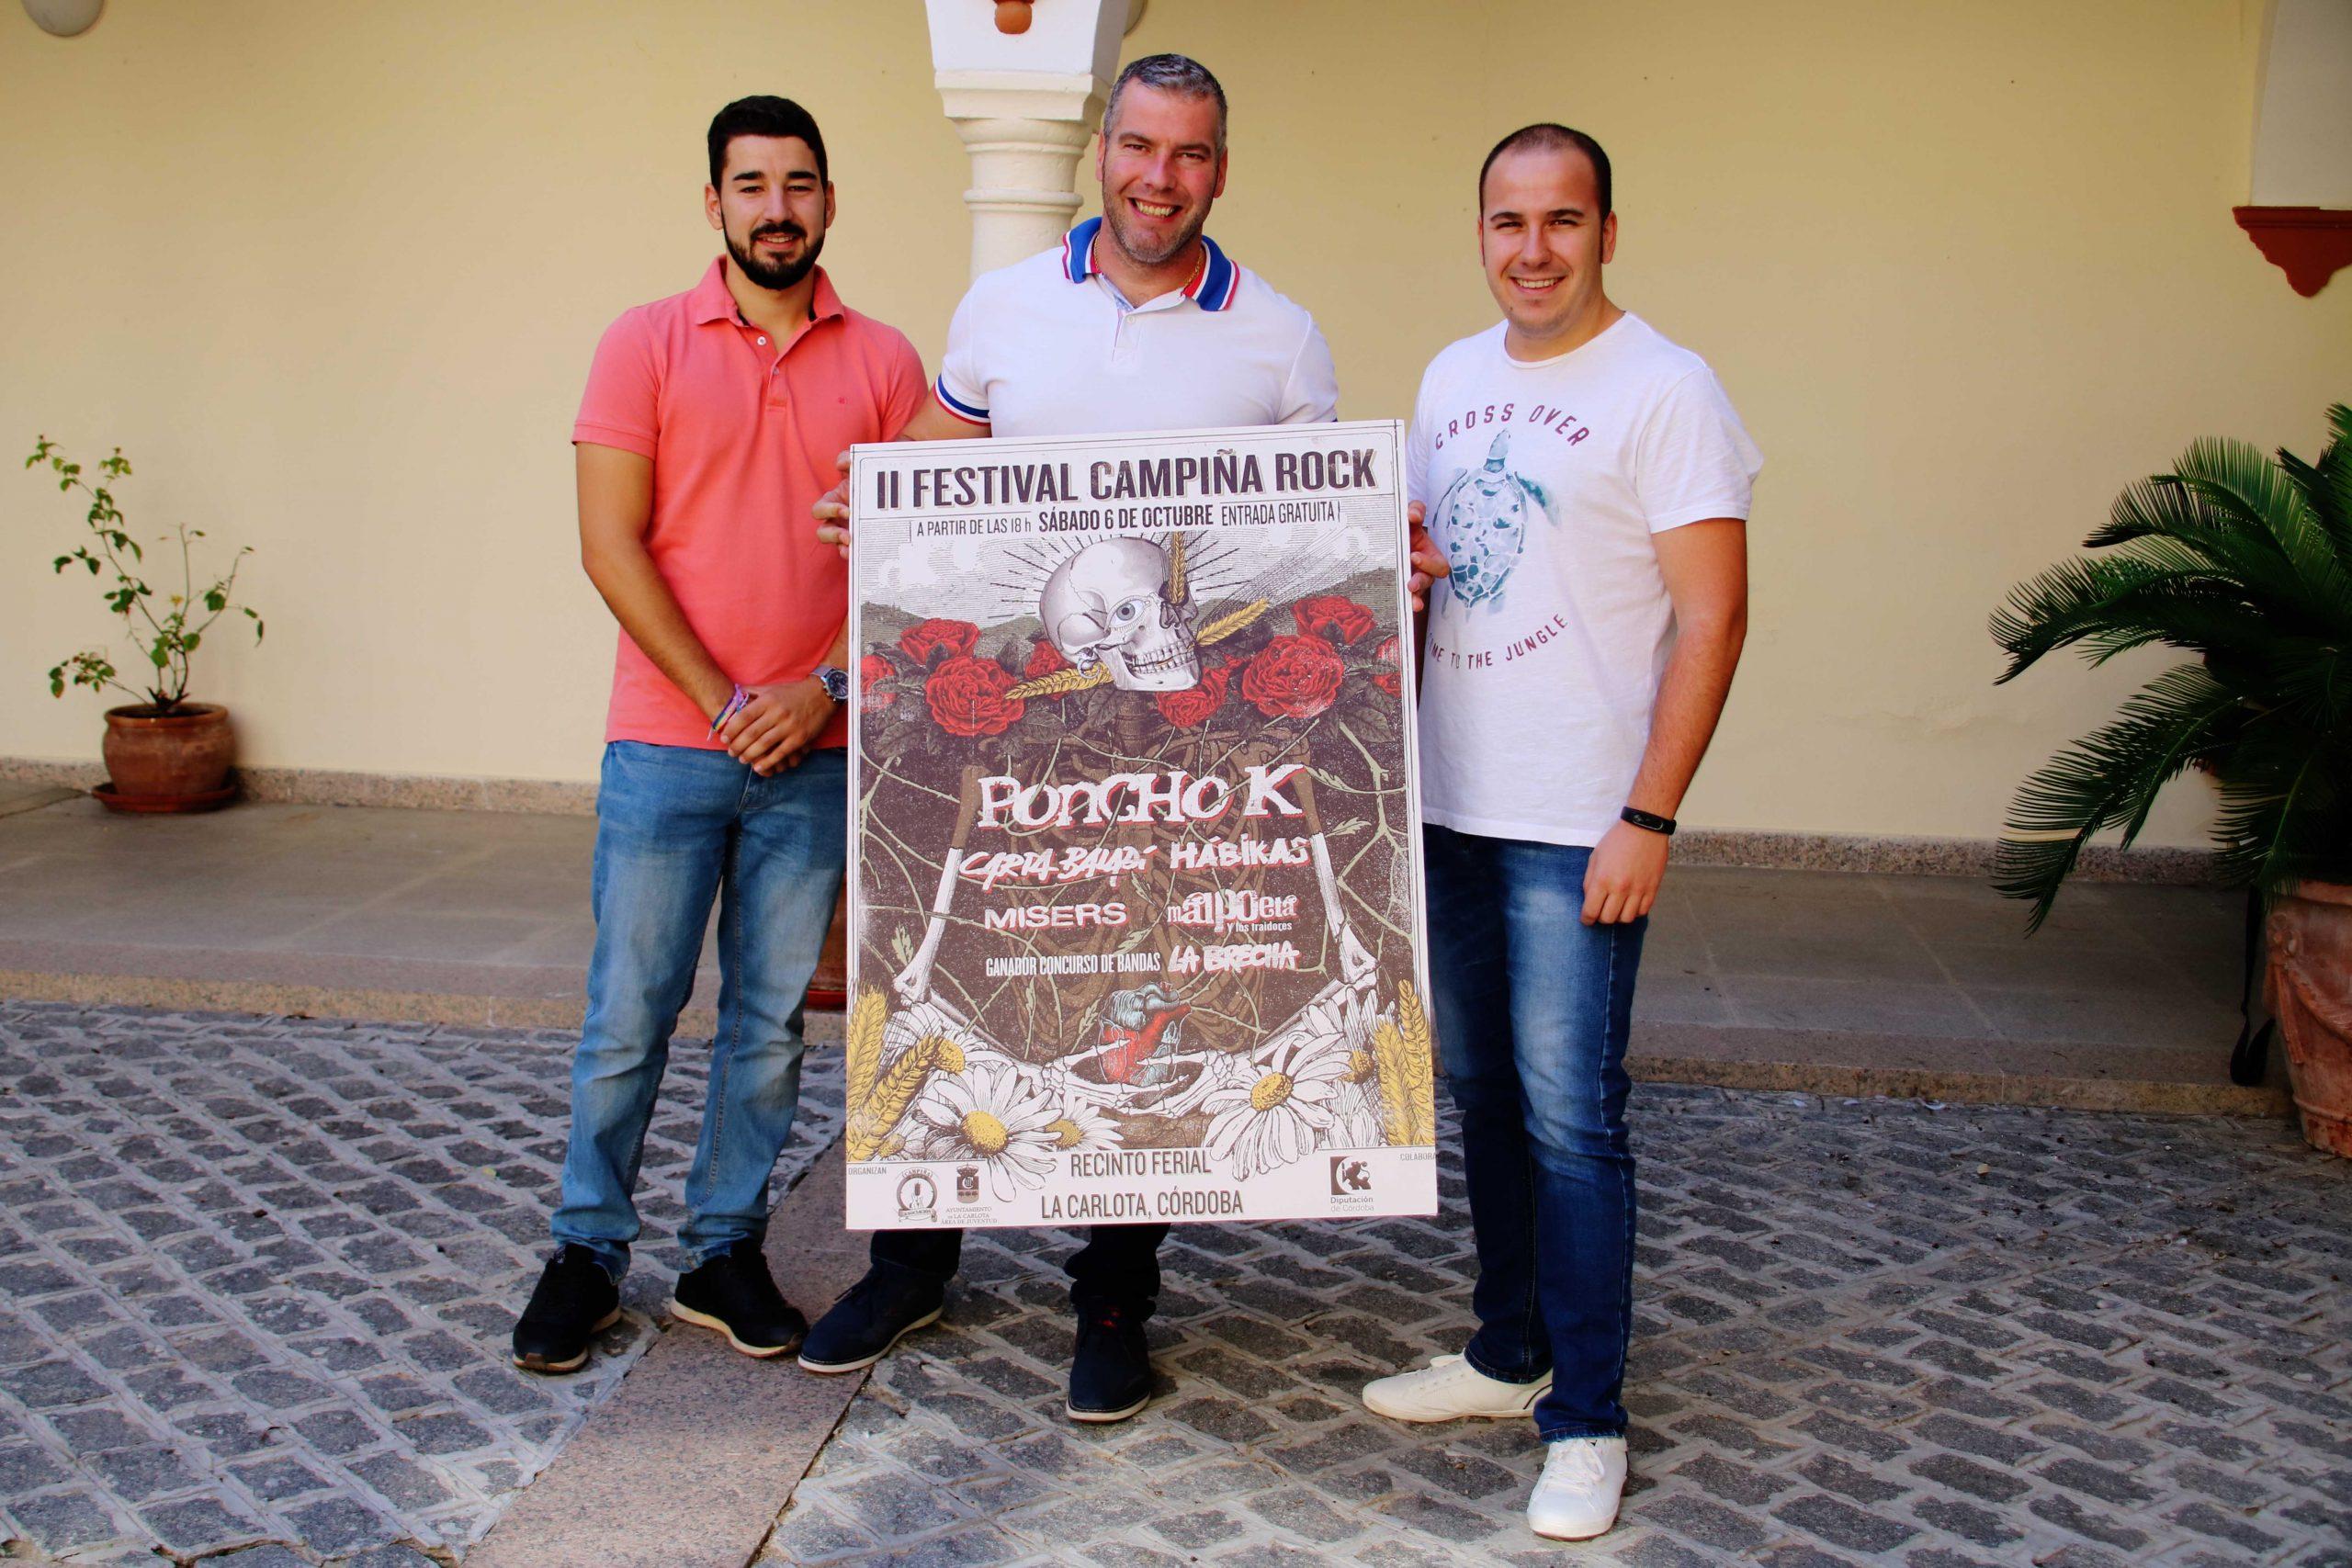 LA CARLOTA CELEBRA SU II FESTIVAL CAMPIÑA ROCK ESTE SÁBADO 6 DE OCTUBRE 1